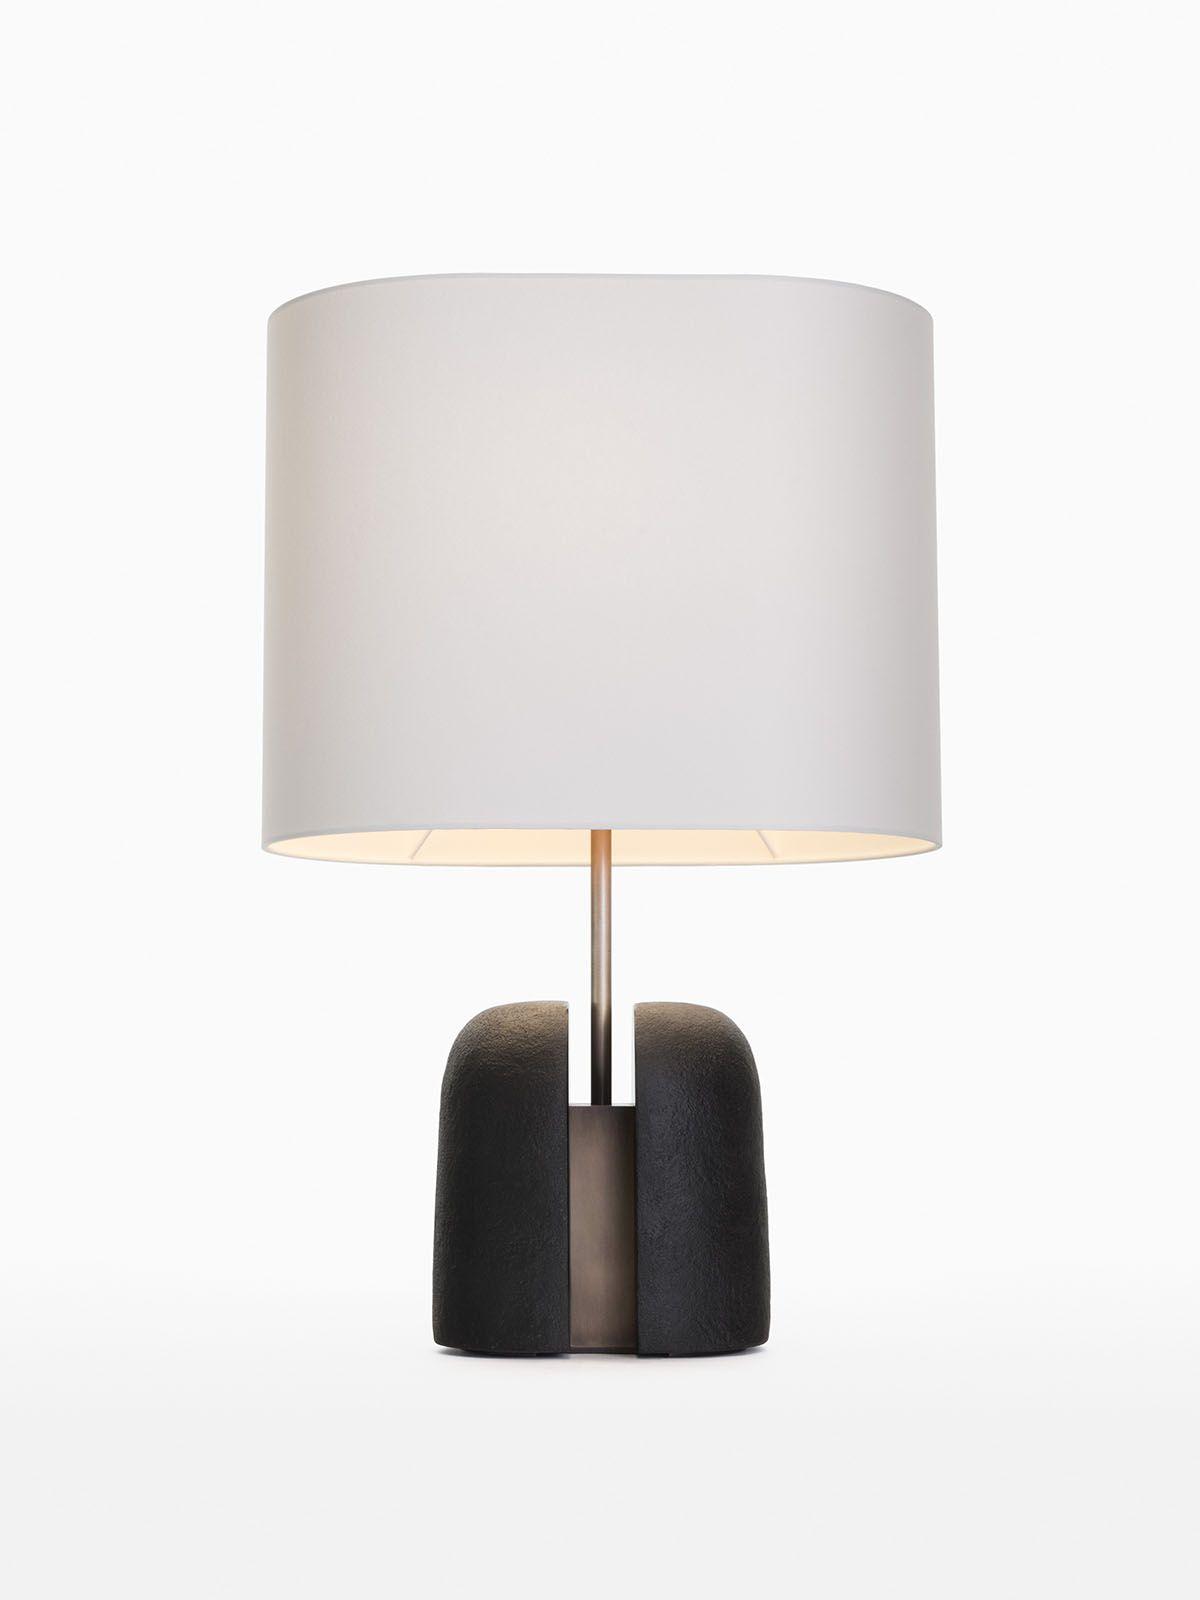 Caste Madoc Table Lamp De Sousa Hughes Table Lamp Lamp Modern Table Lamp